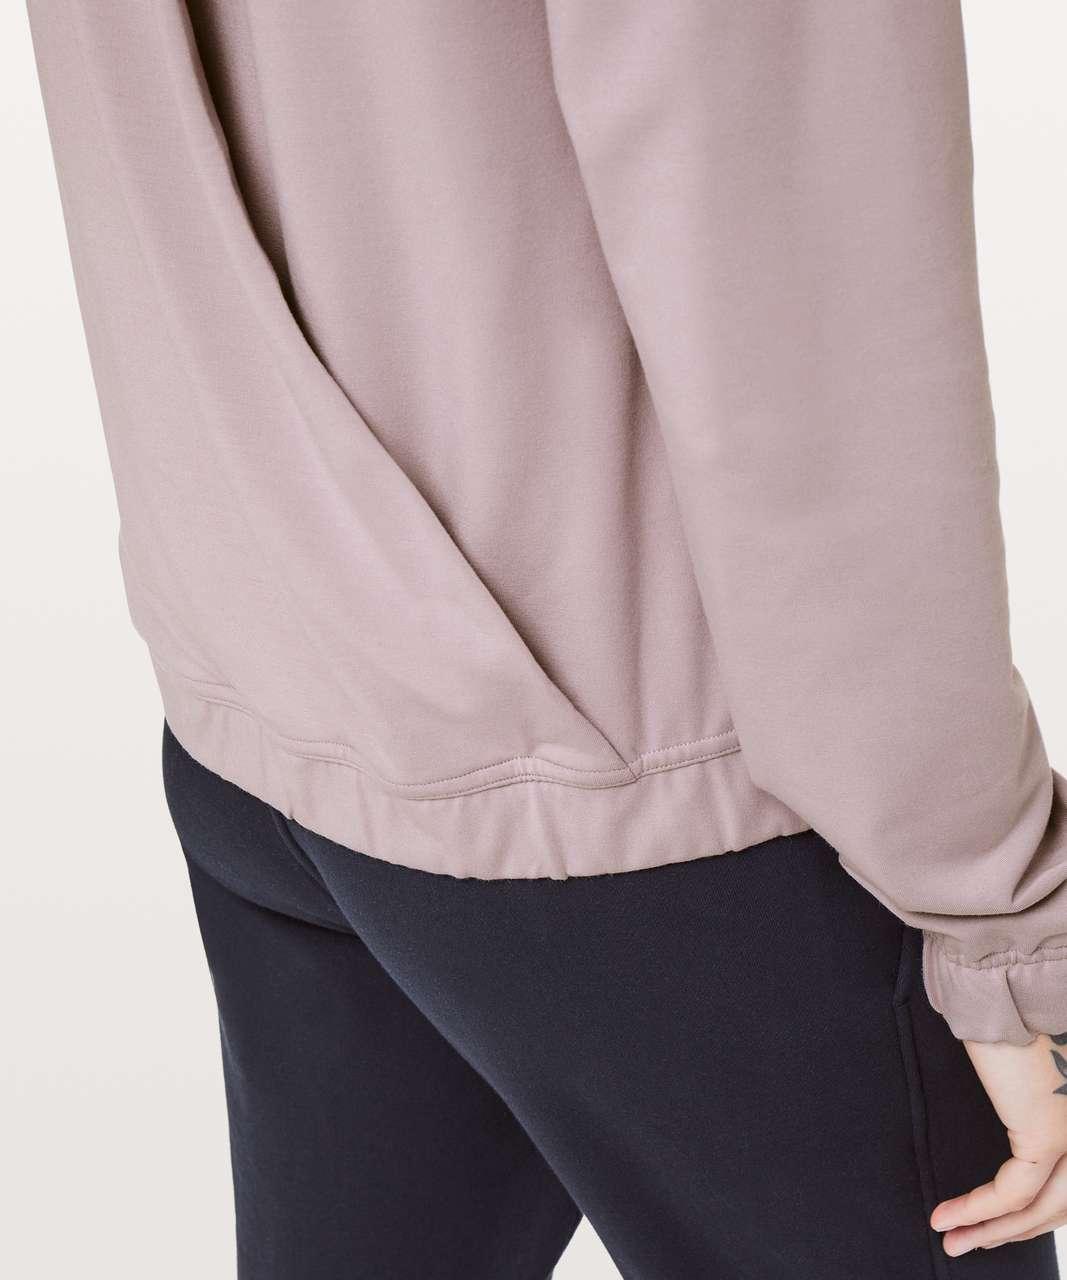 Lululemon Twisted & Tucked Pullover - Smoky Blush